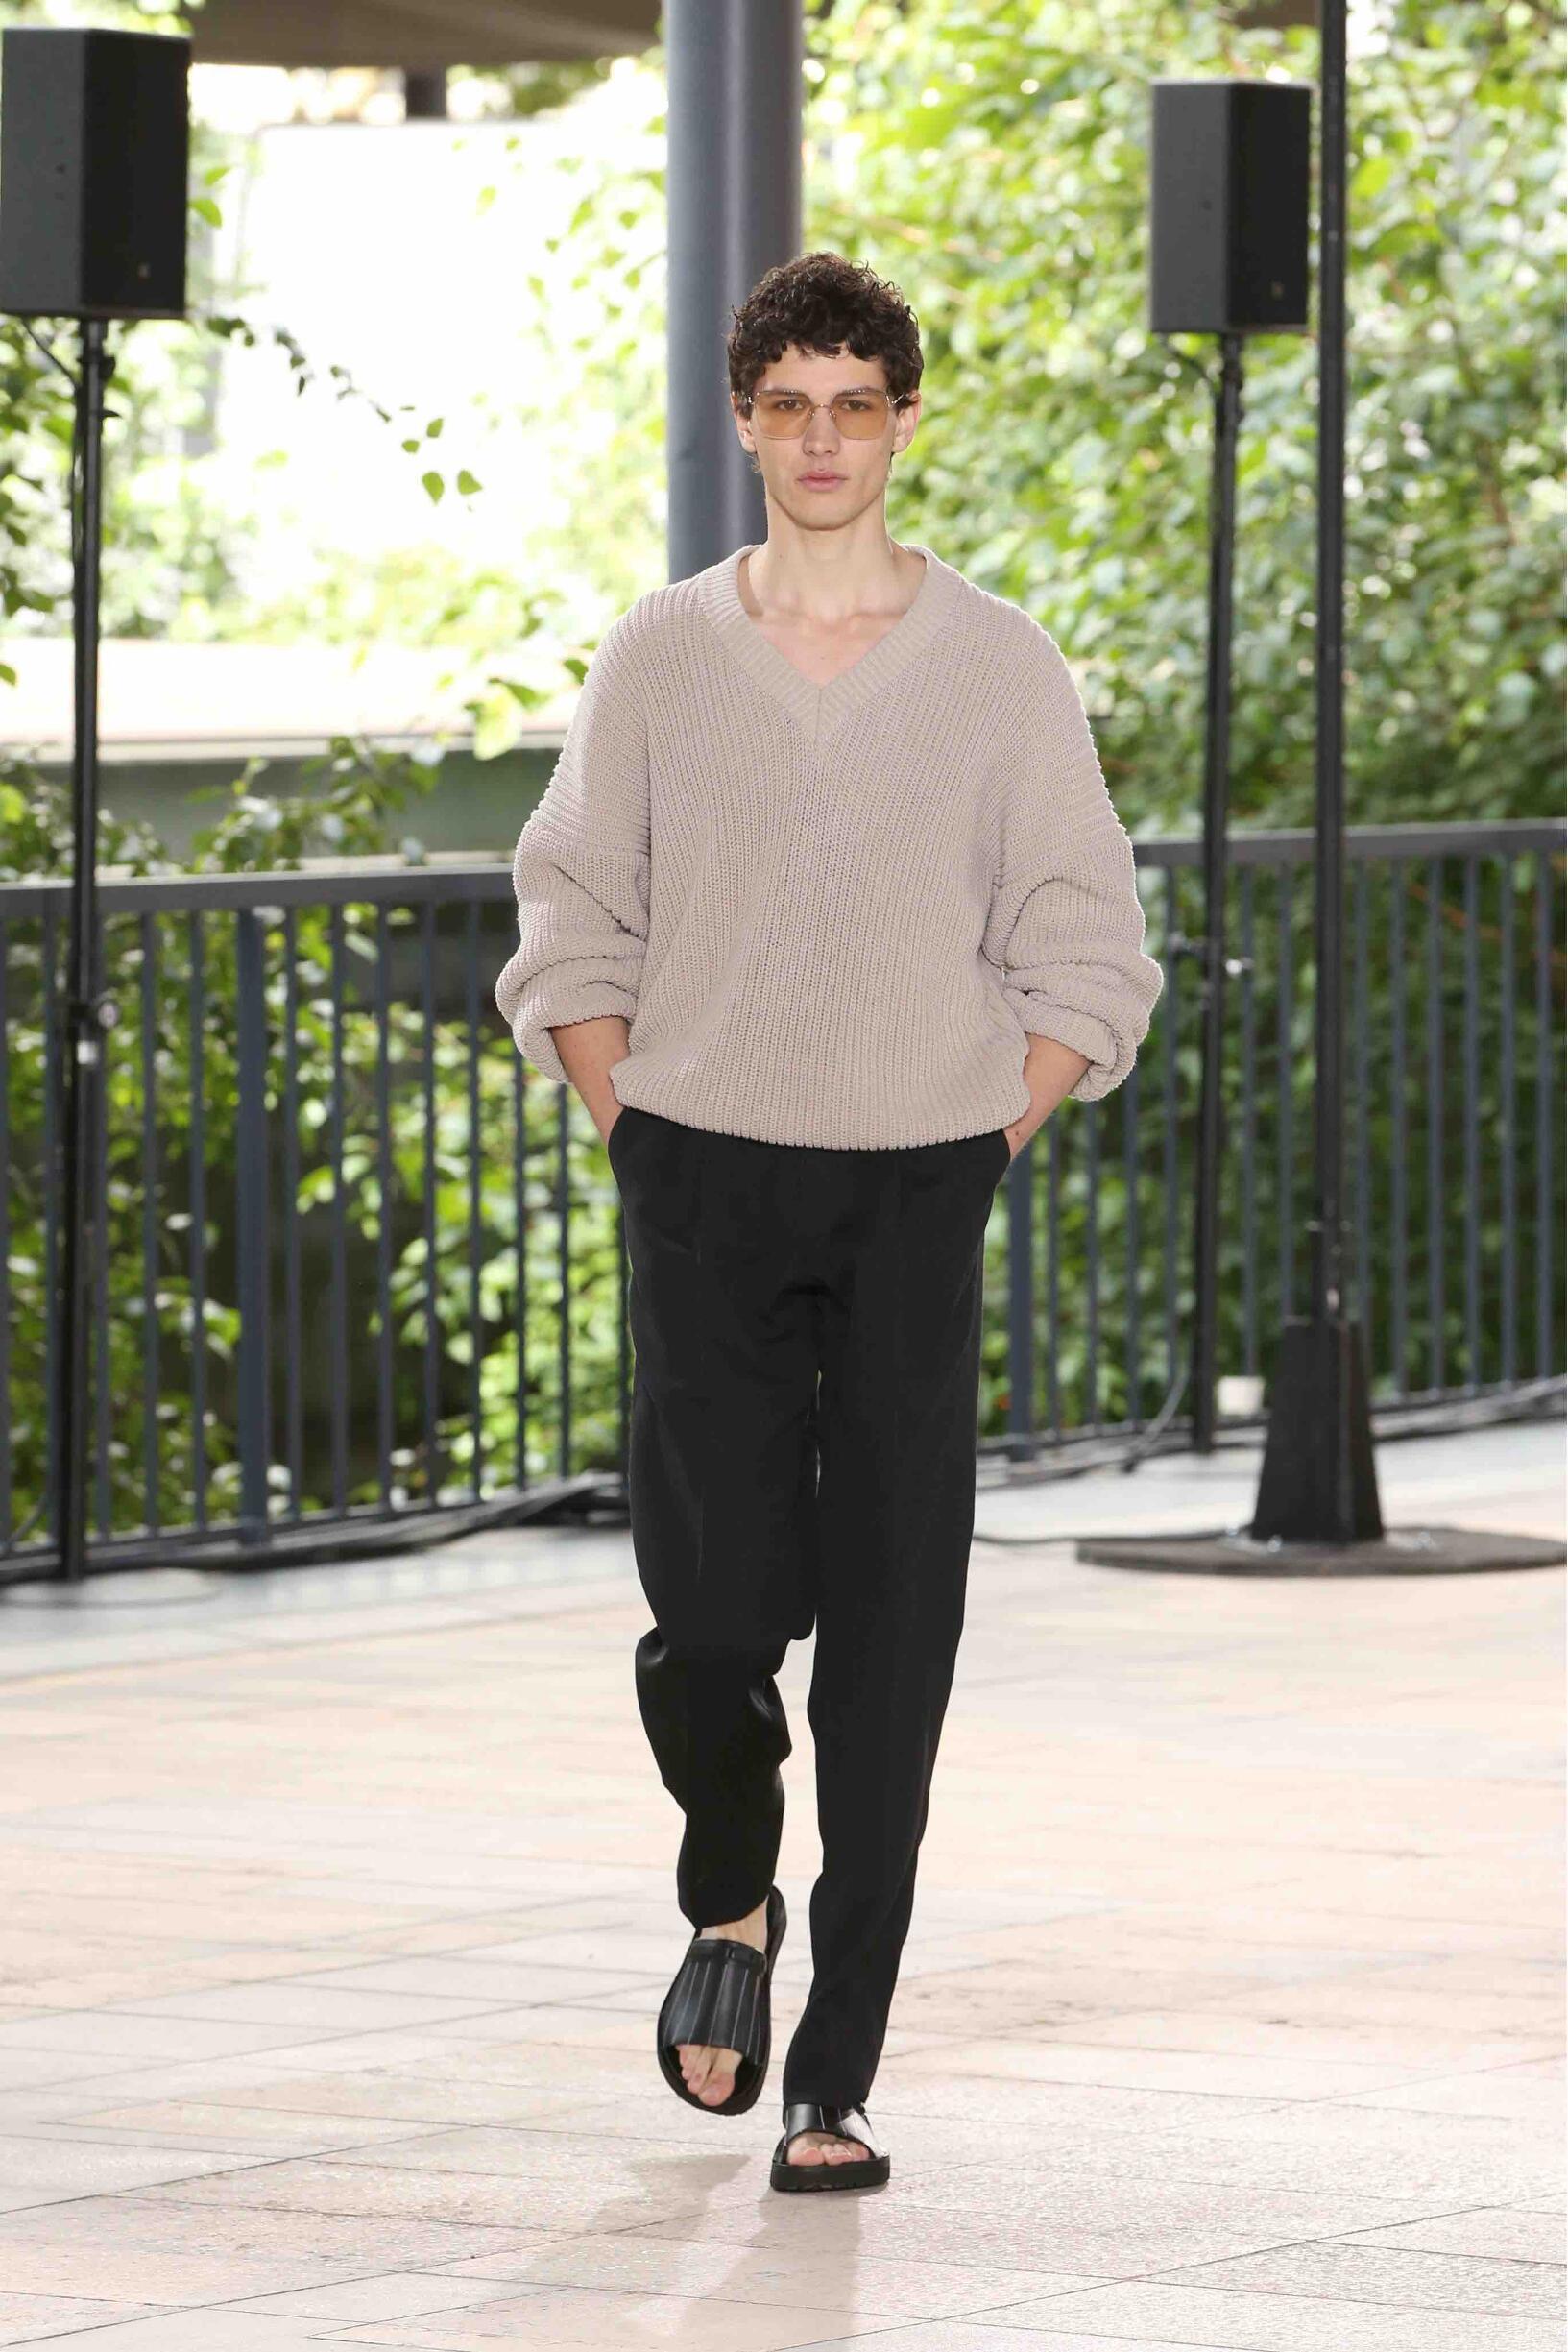 Issey Miyake SS 2019 Menswear